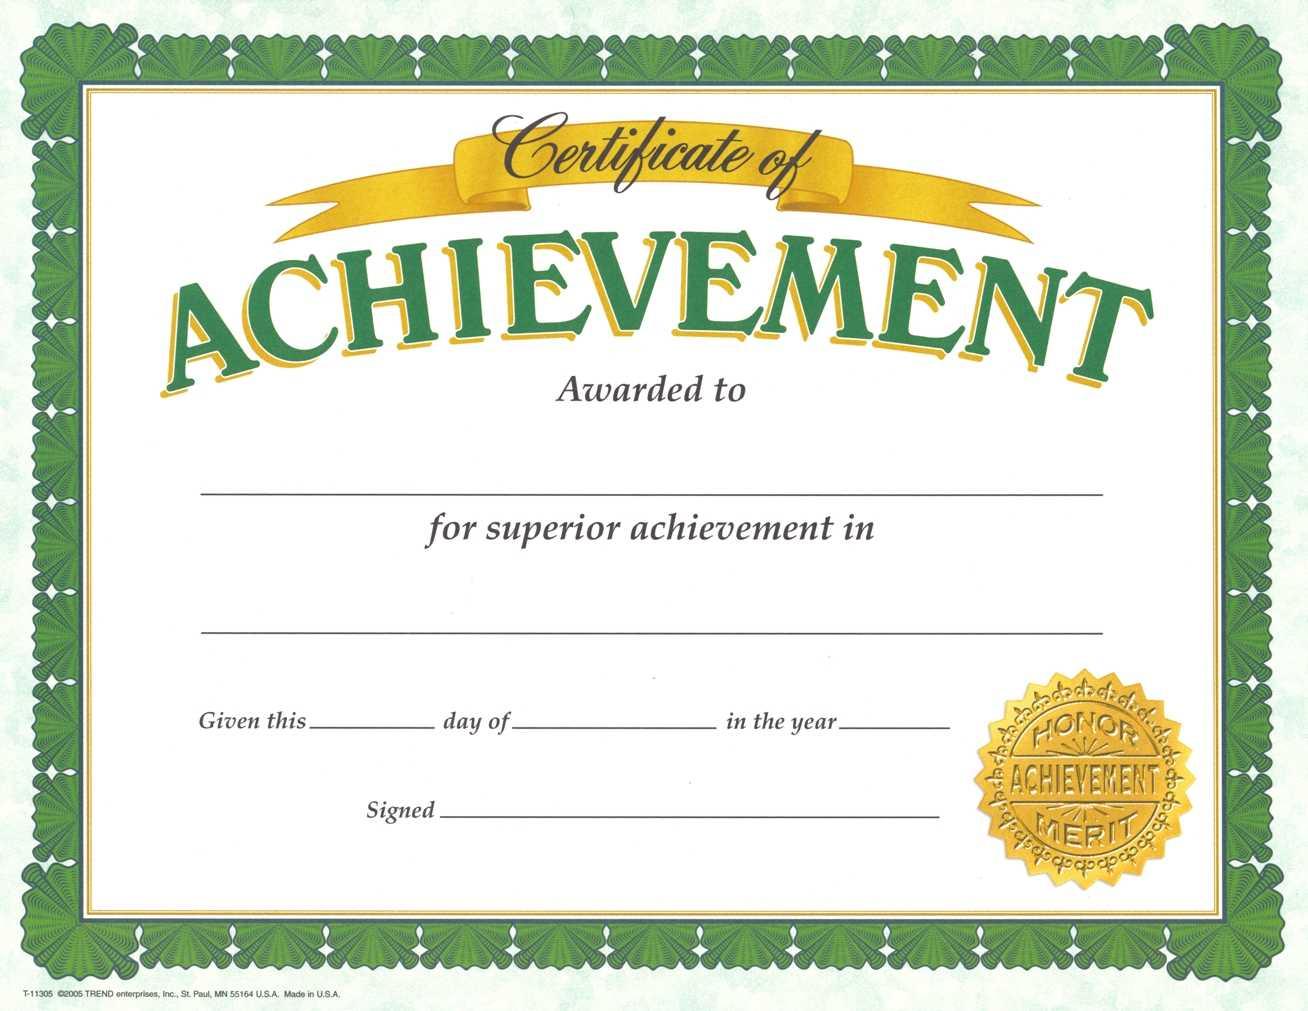 Certificate Of Achievement Template – Certificate Templates For Army Certificate Of Achievement Template